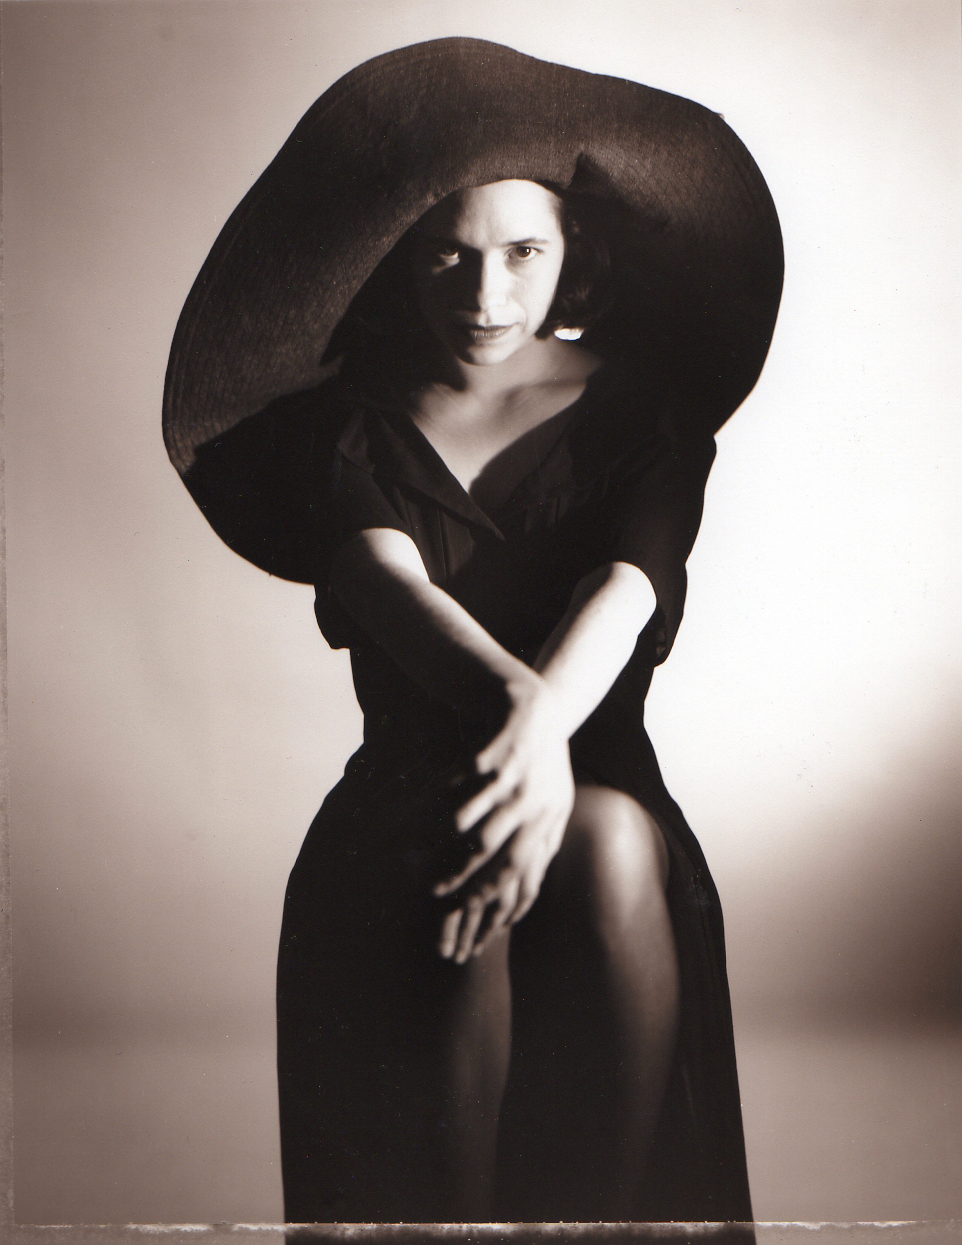 Natalie Merchant Rolling Stone Photo, Frank Ockenfels